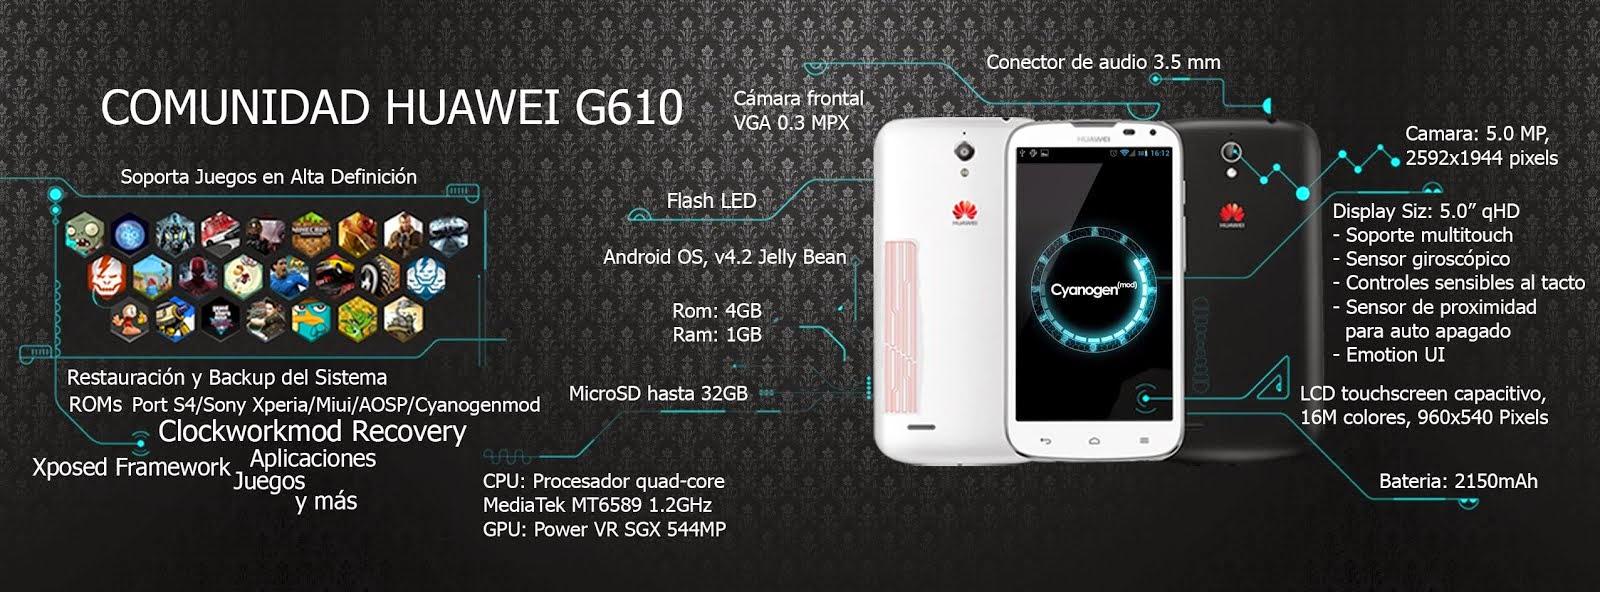 app huawei g610